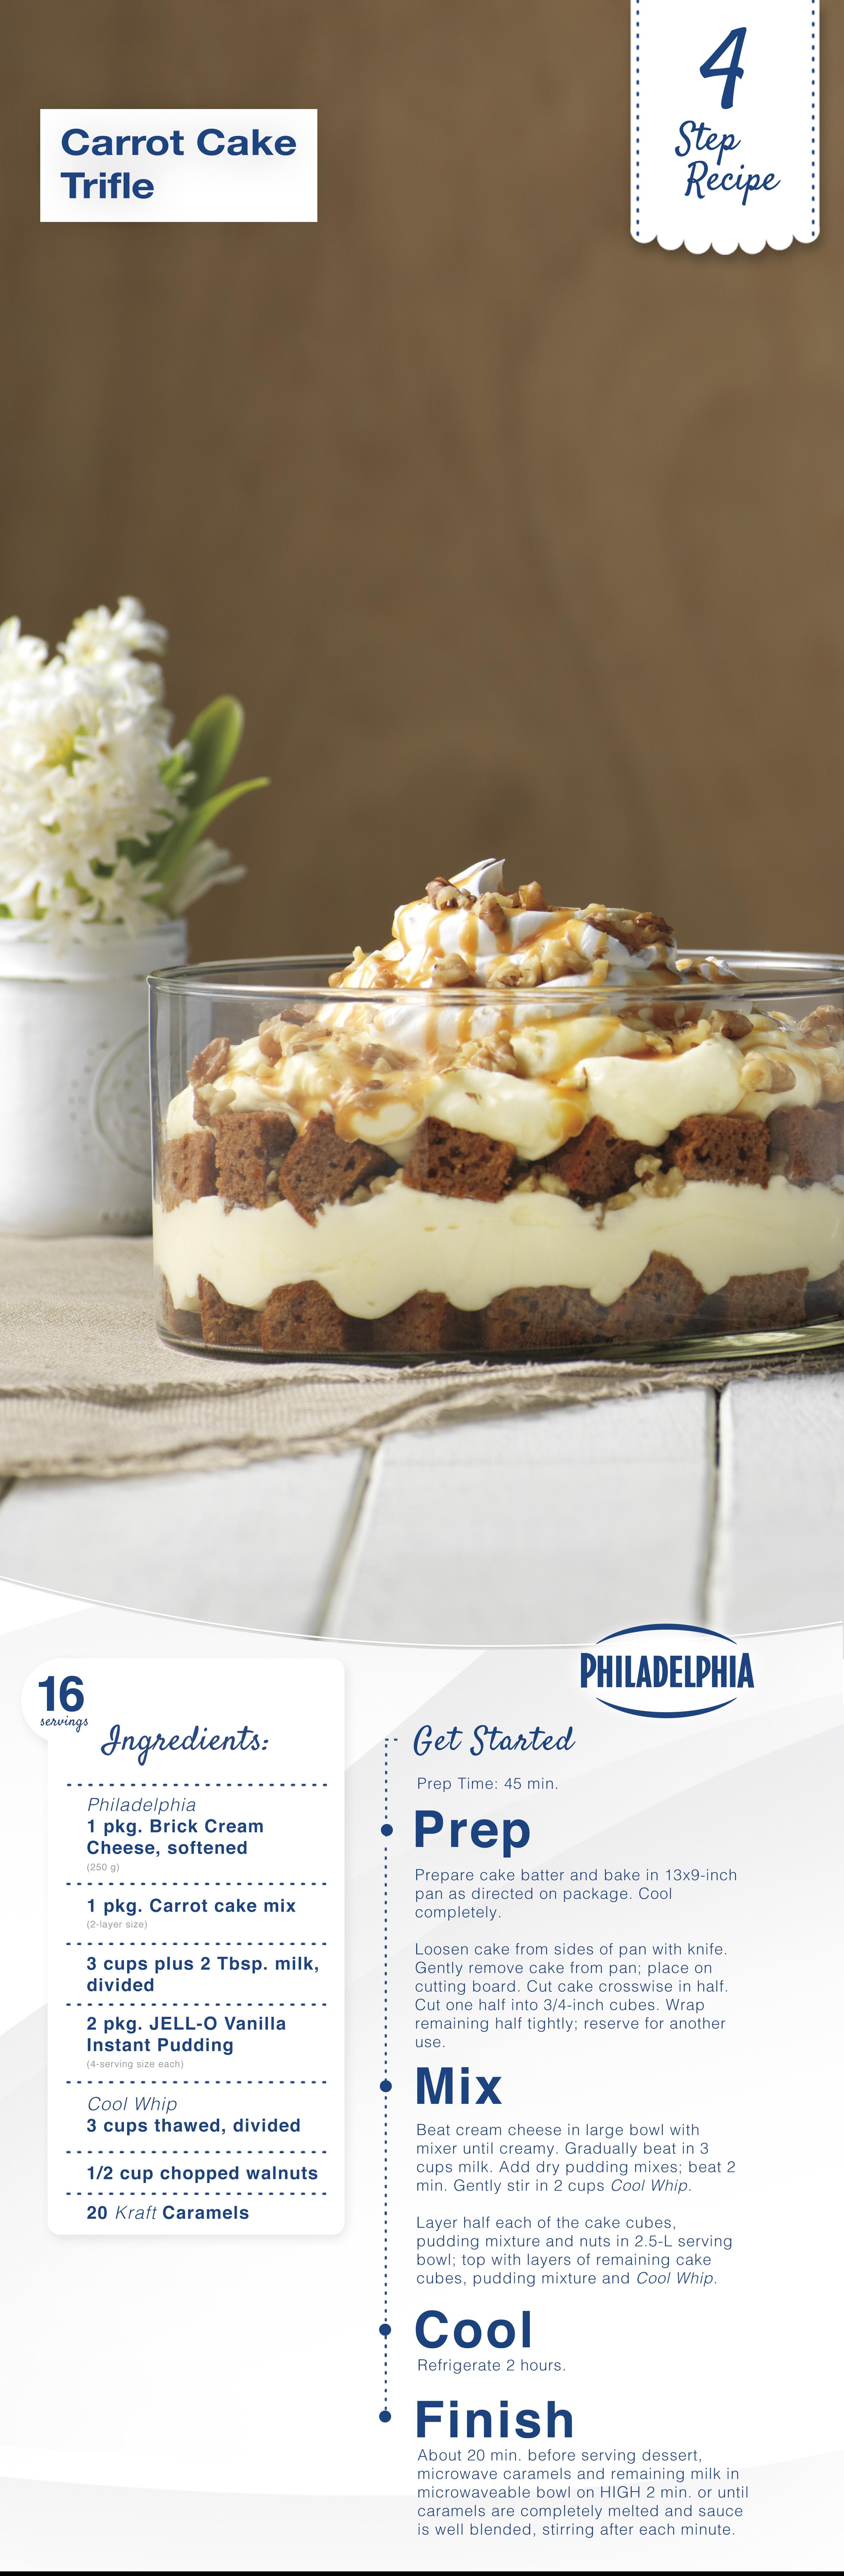 Carrot cake recipe philadelphia cream cheese